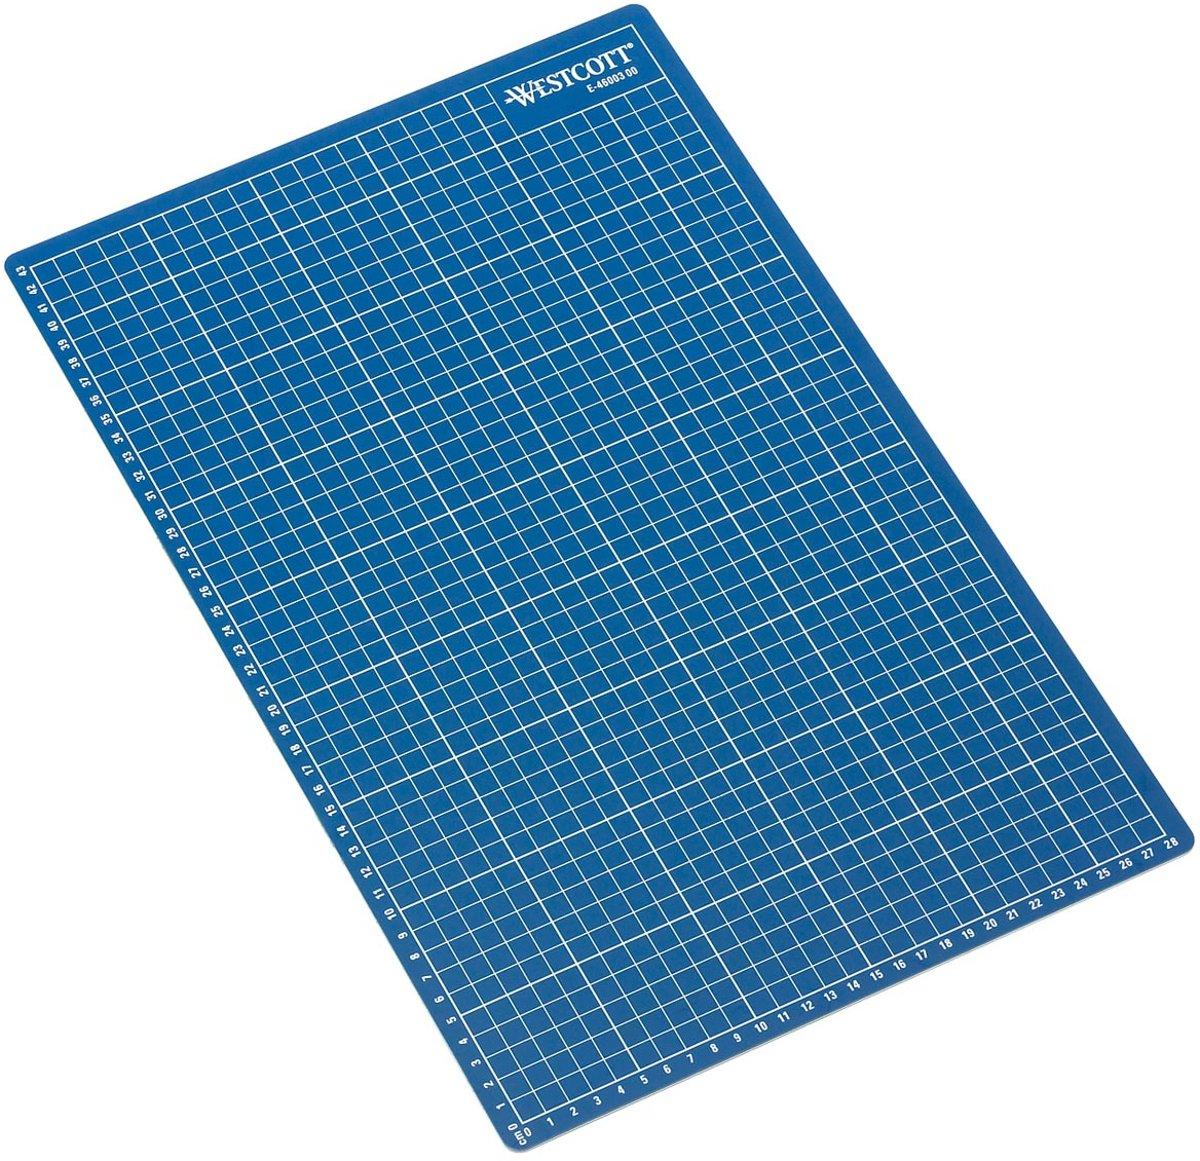 6x Westcott snijmat blauw A3 kopen